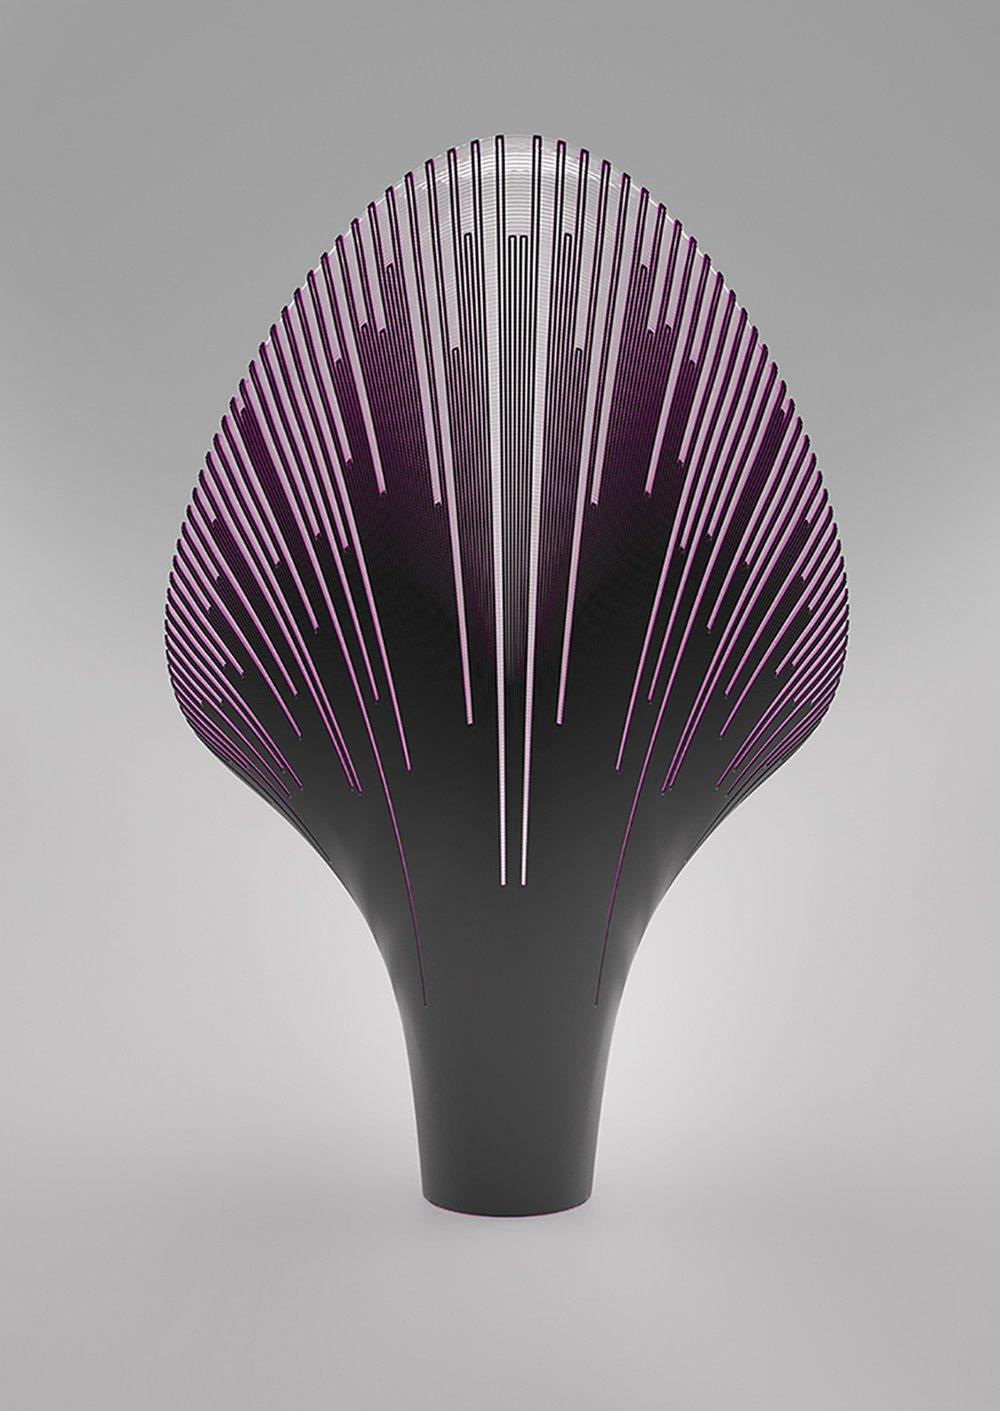 3D-Printed Chairs-Zaha Hadid-Visual Atelier 8-6.jpg